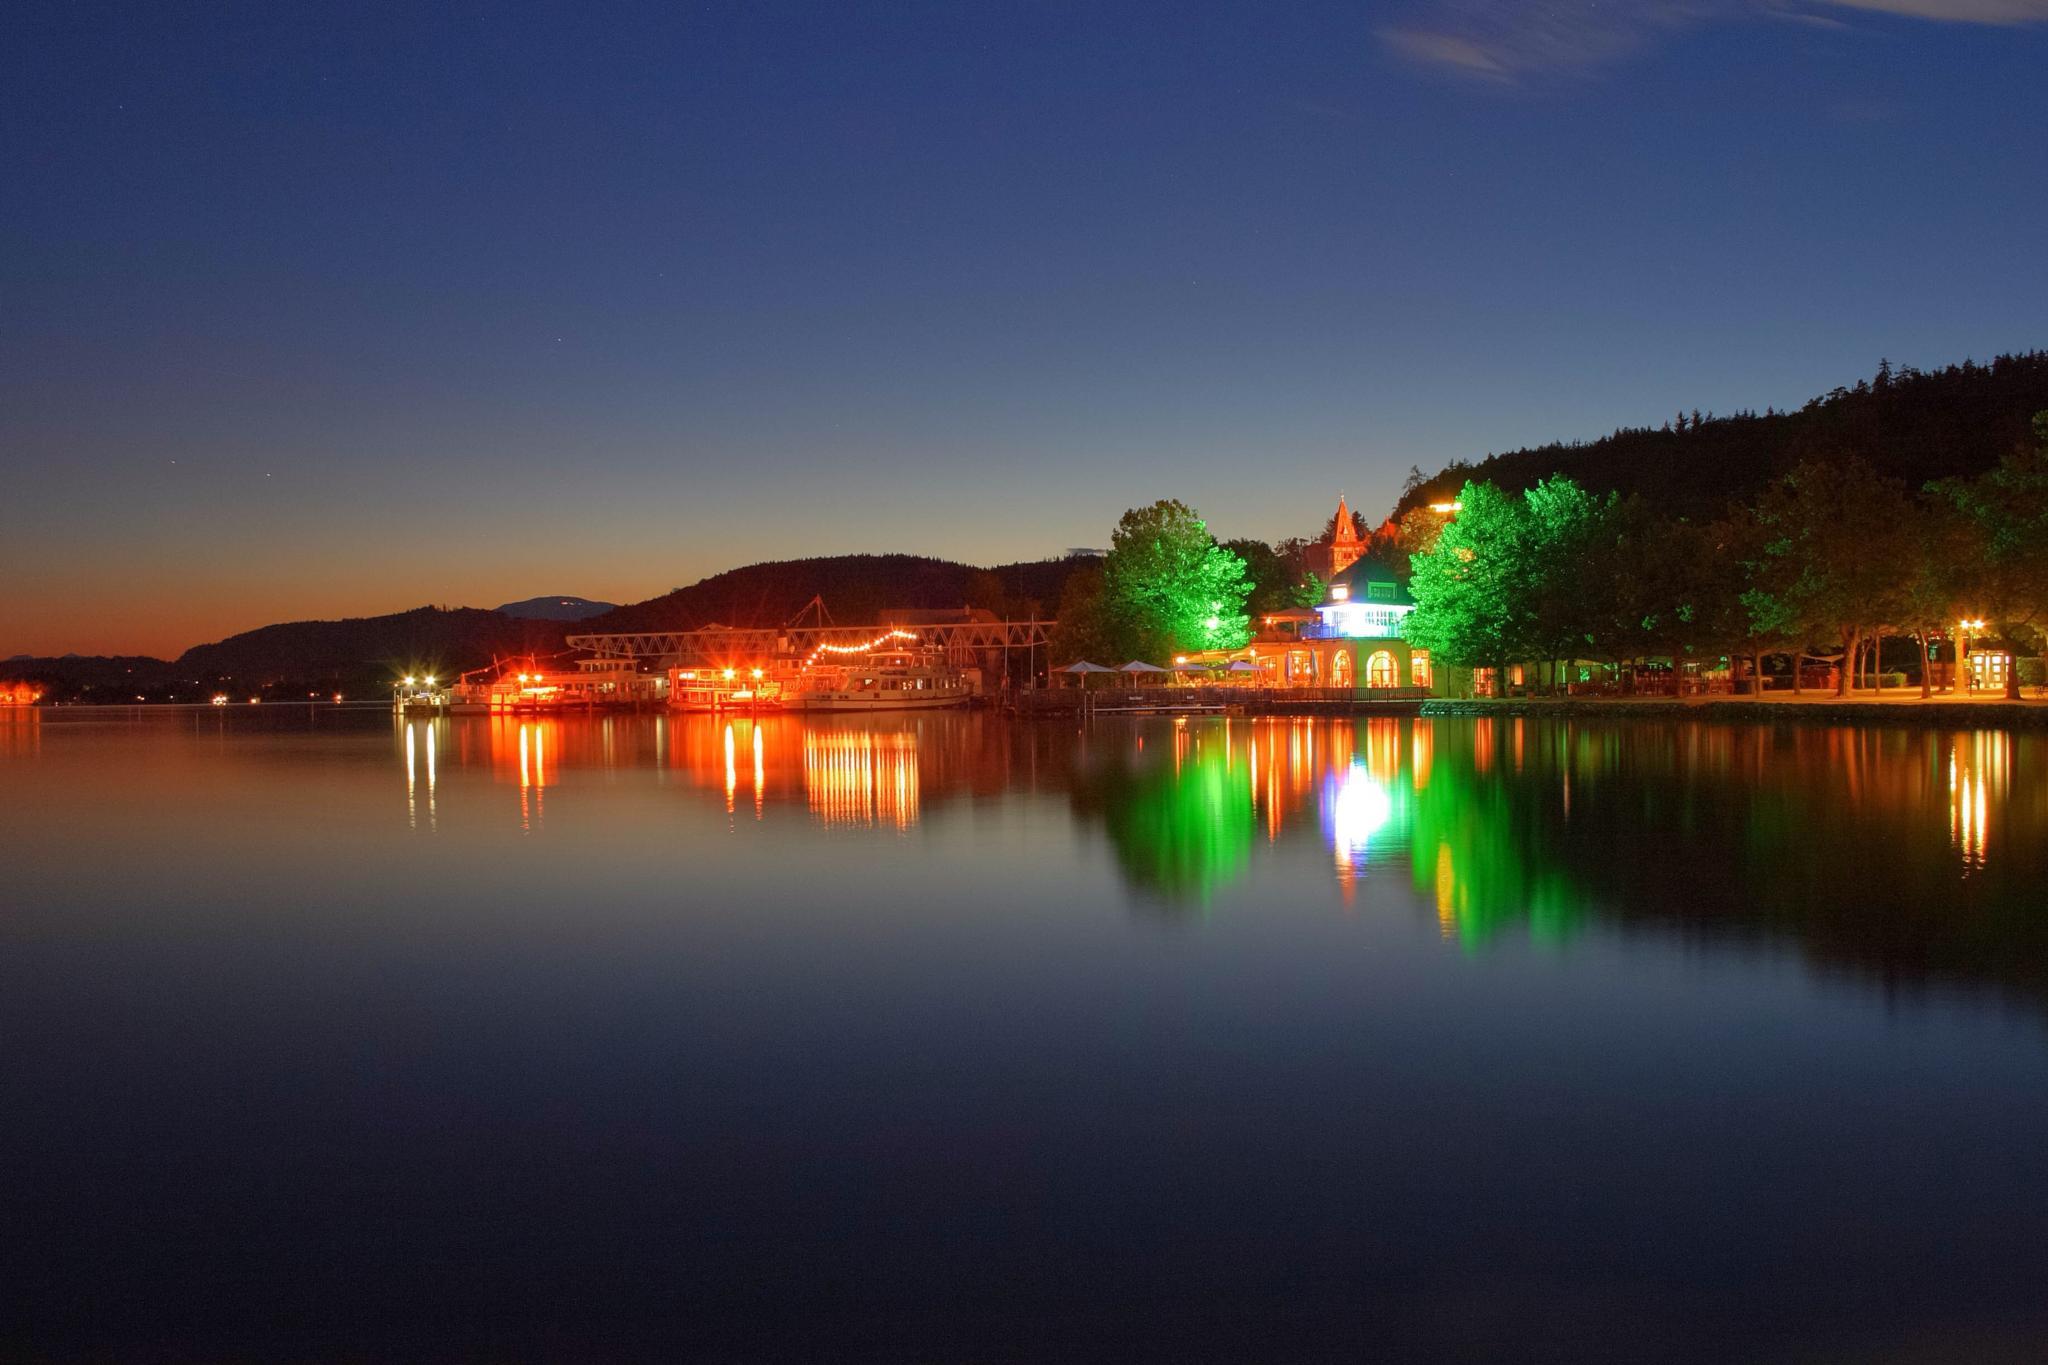 Harbor Klagenfurt by werner gruse